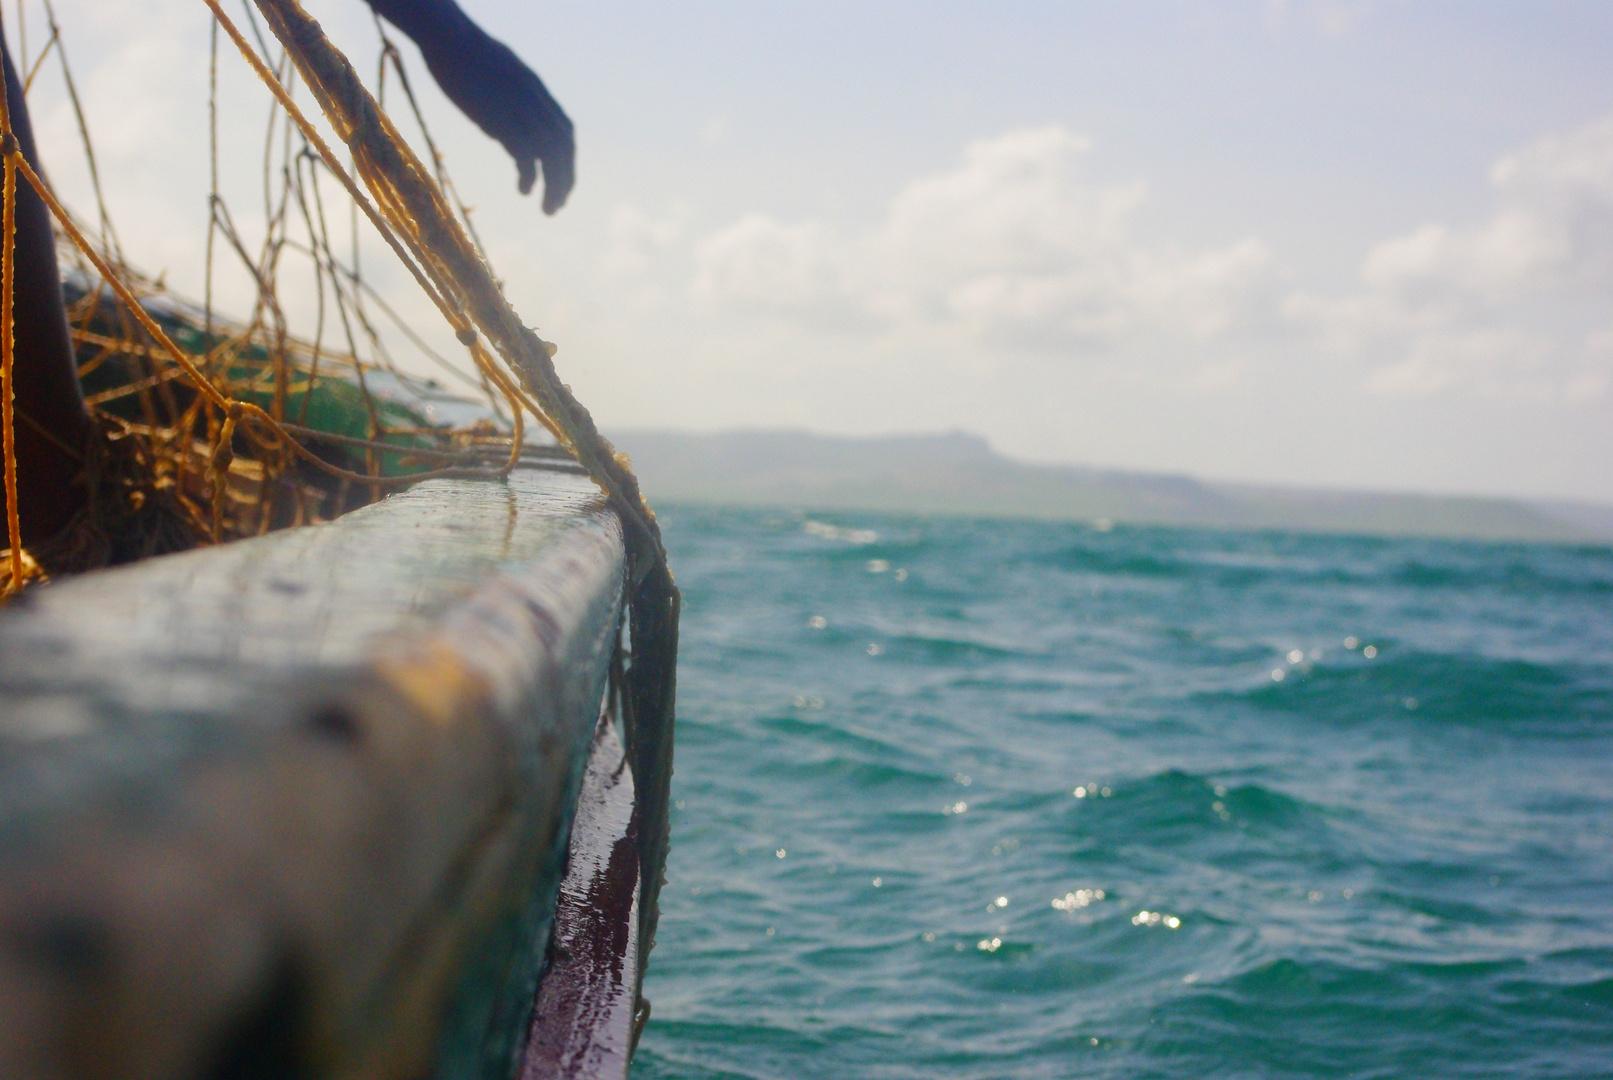 pêche dans la baie de diego